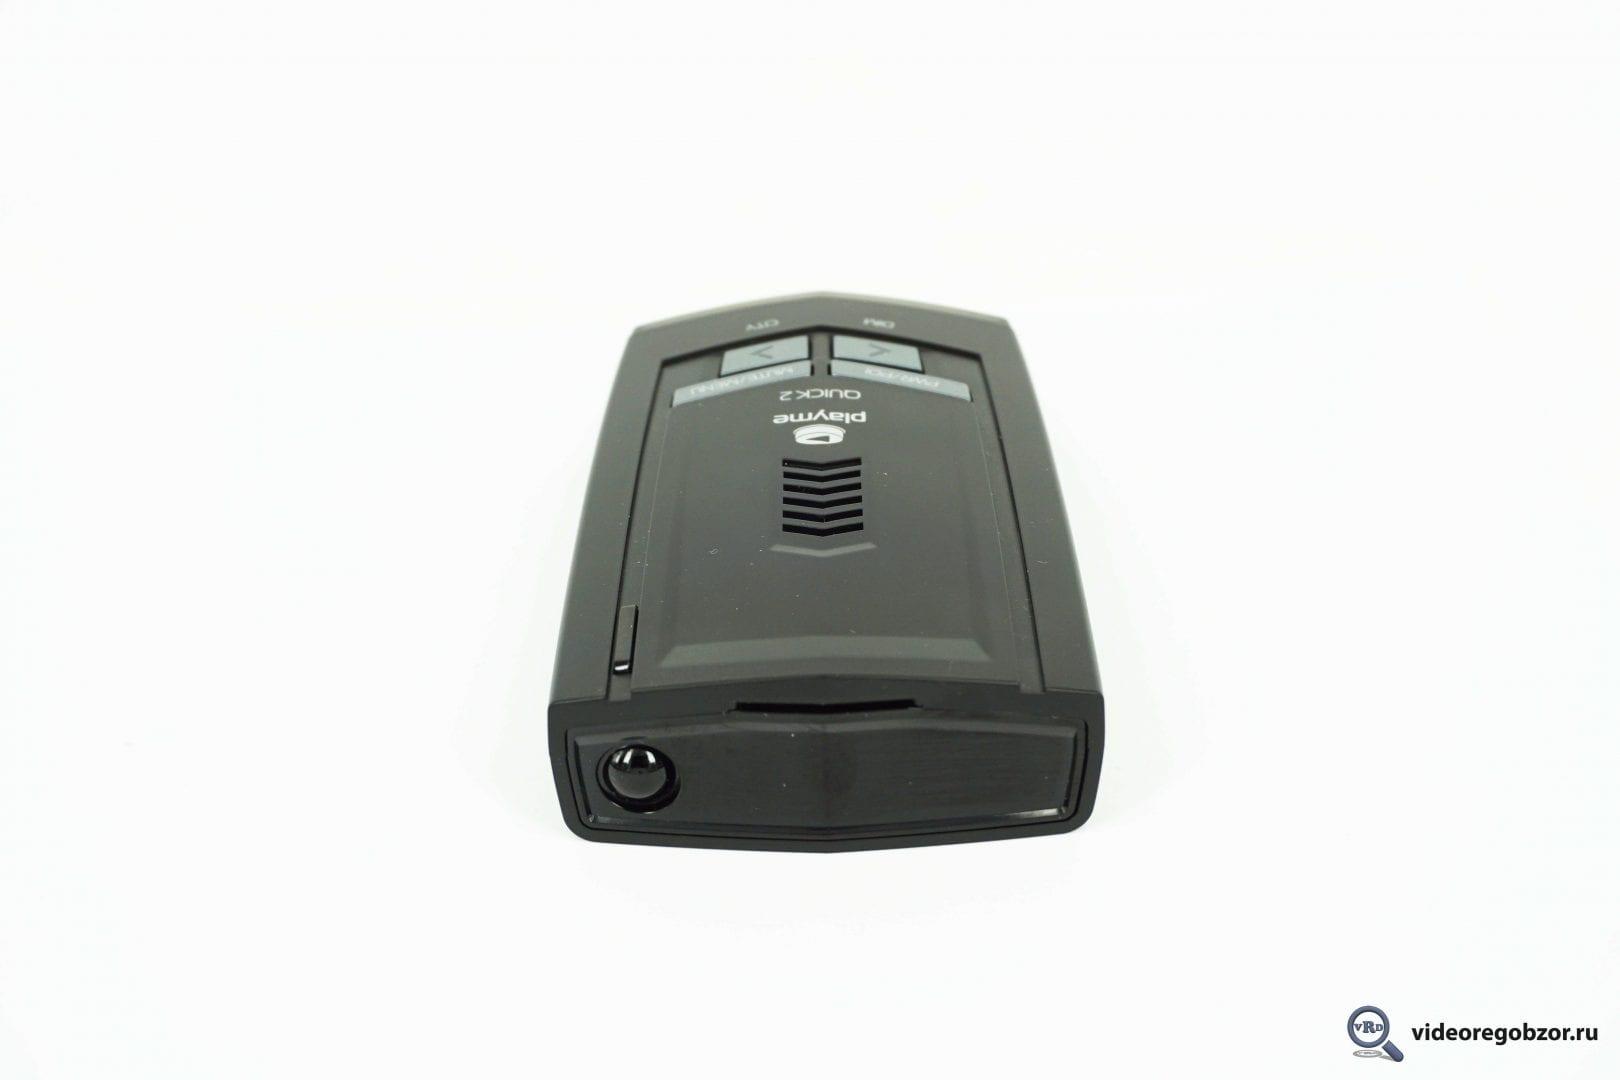 obzor radar detektora playme quick 2 18 1620x1080 - Обзор радар-детектора PlayMe QUICK 2.